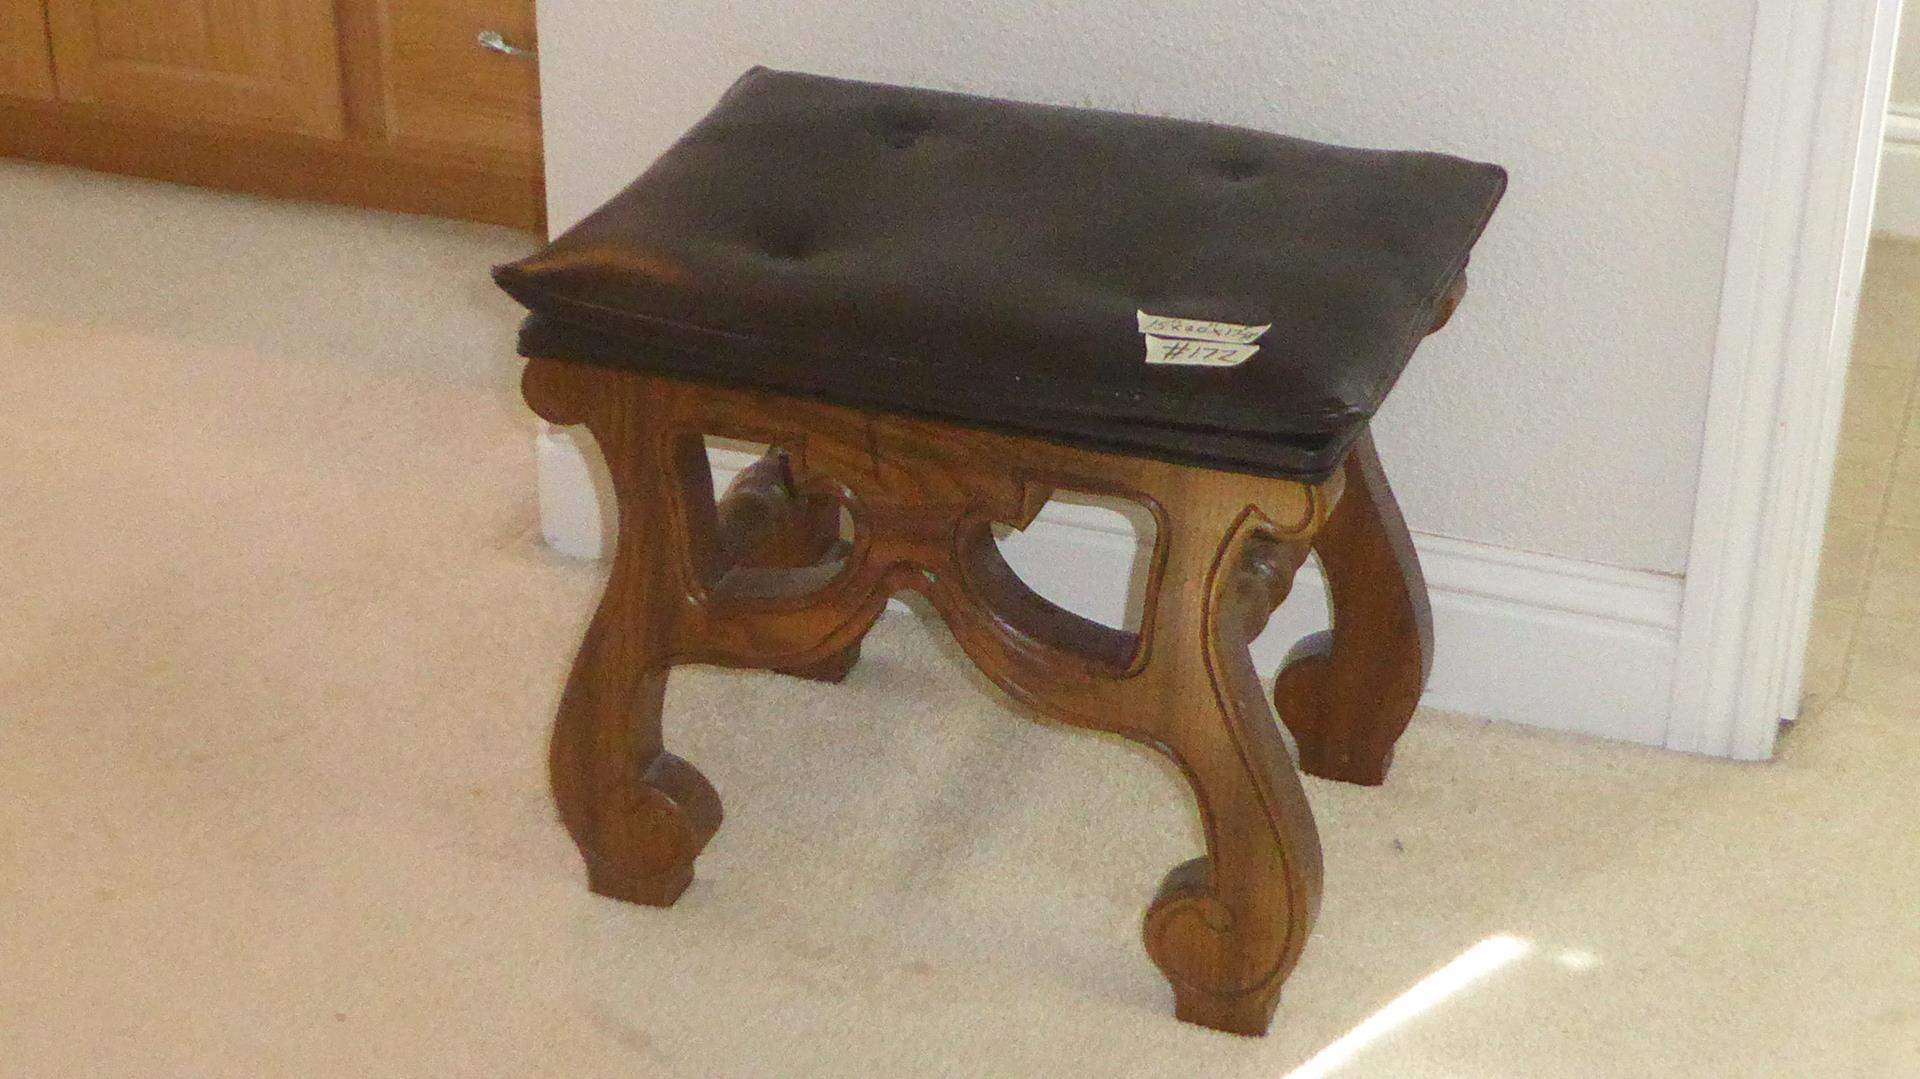 Lot # 172 - Vintage 'Stanley Furniture Co.' Small Wood Framed Bench (main image)